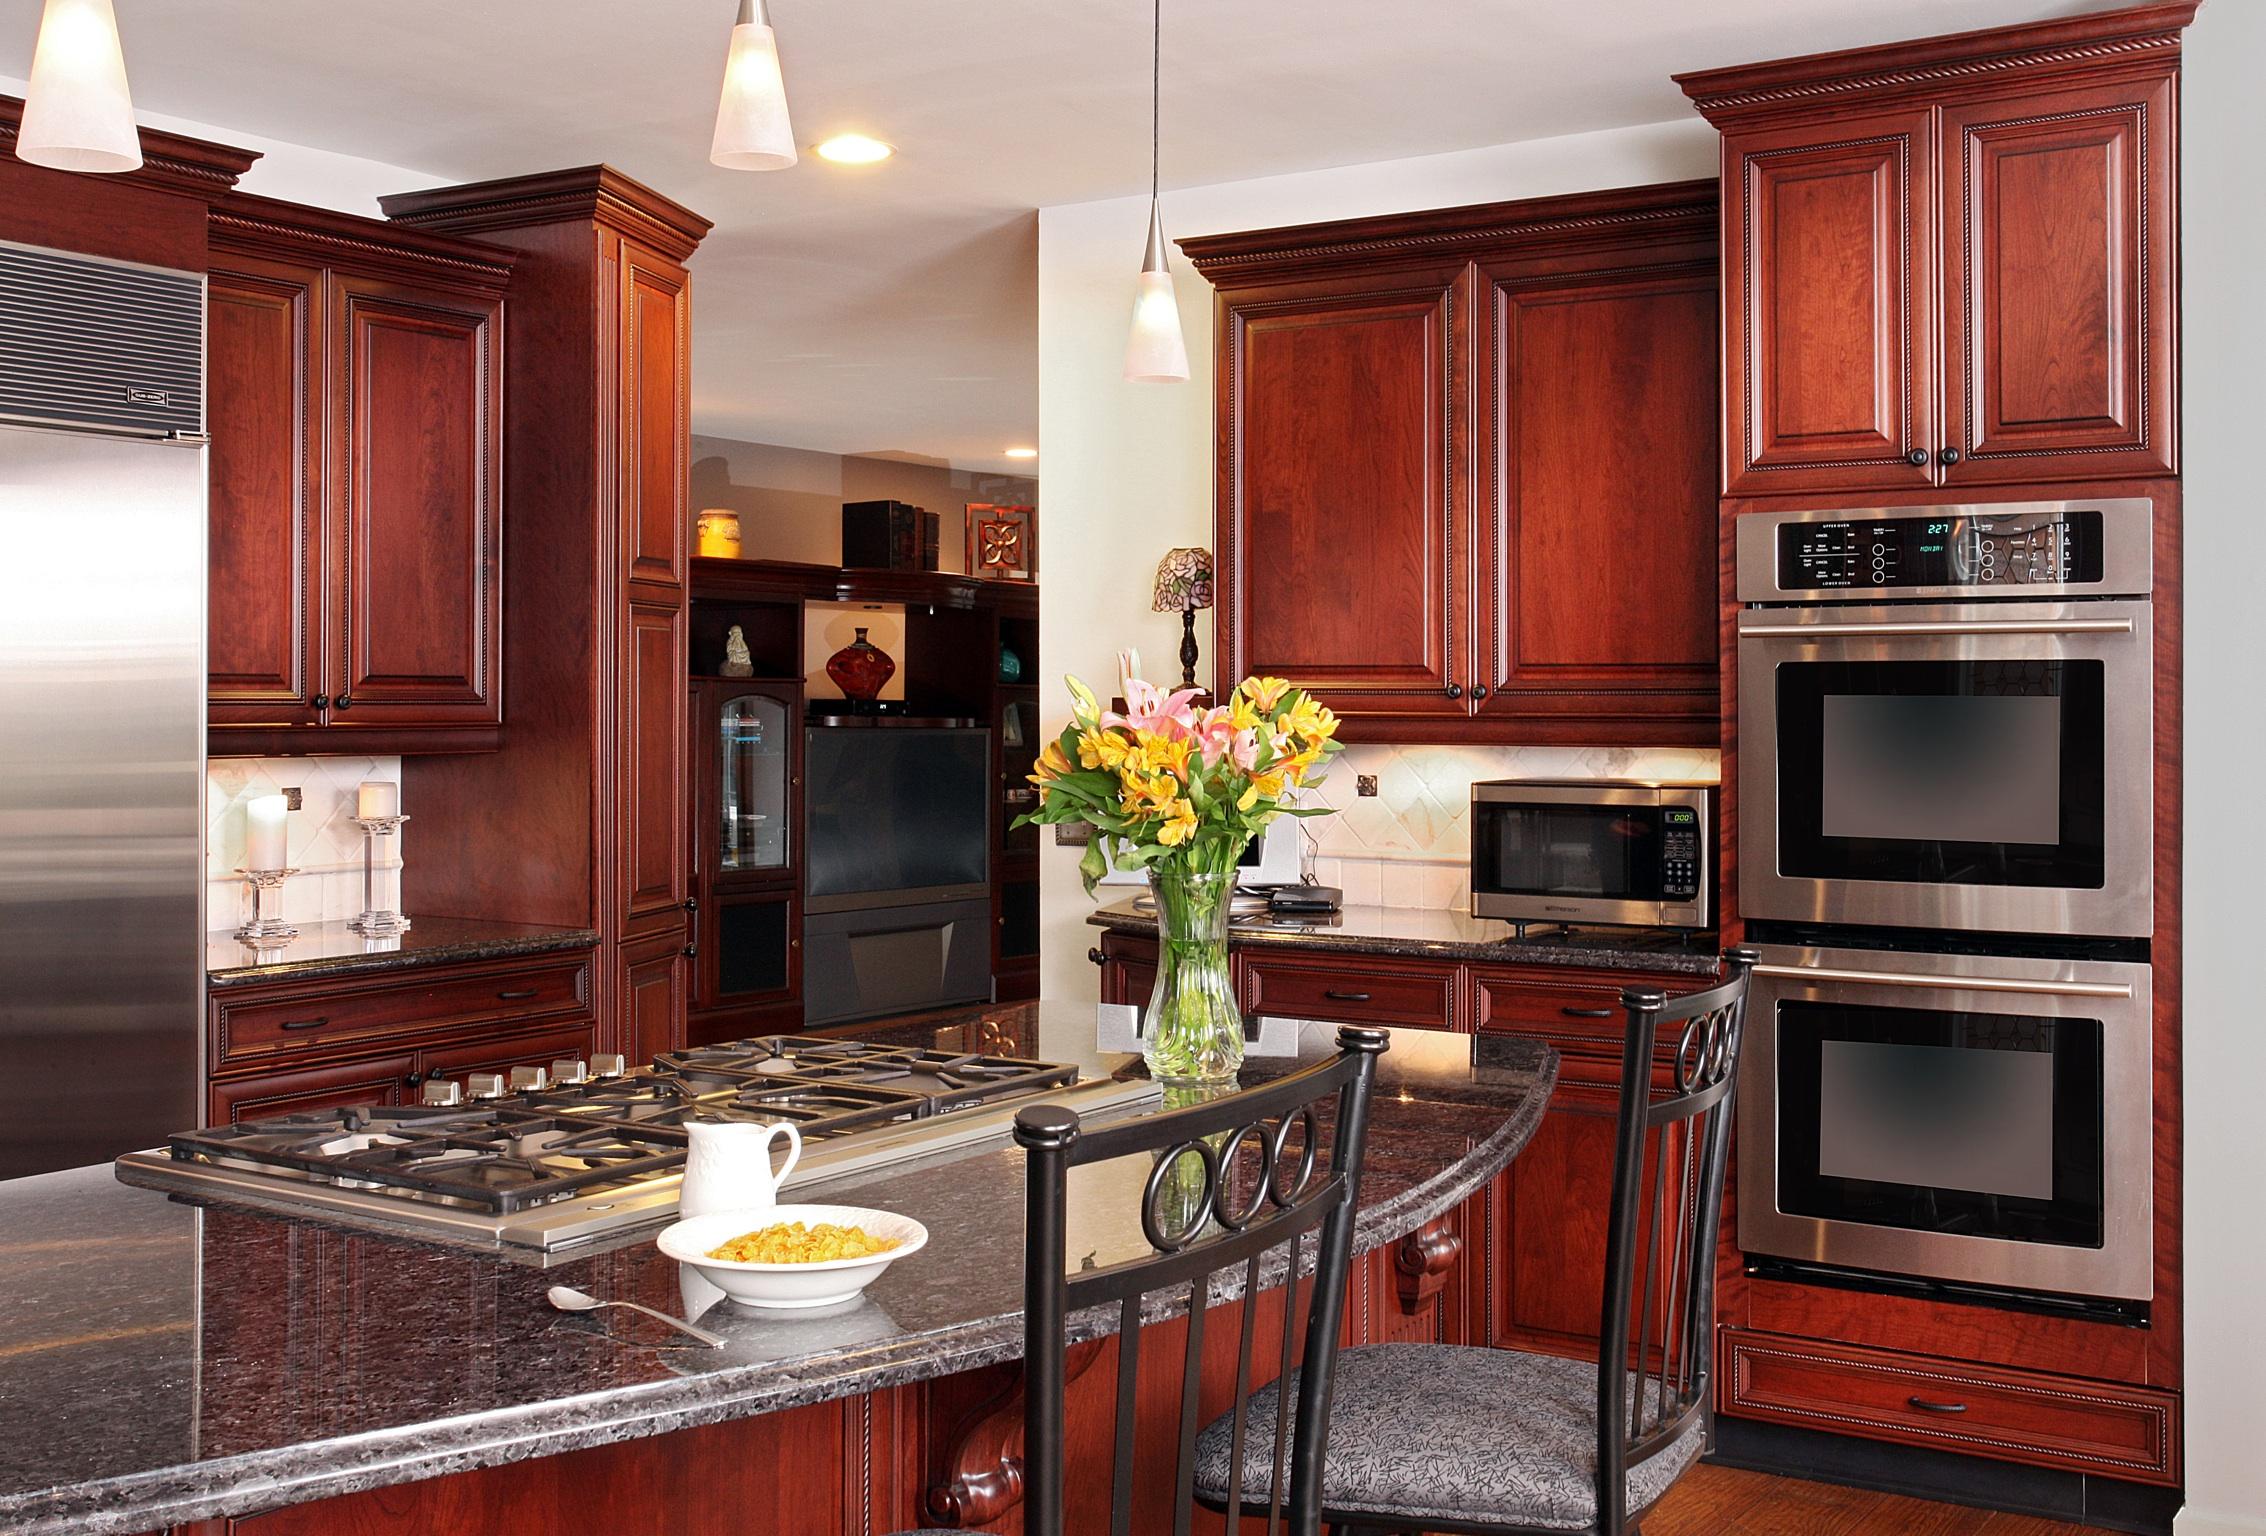 Cabinet crown molding uneven ceiling images - Kitchen cabinets without crown molding ...